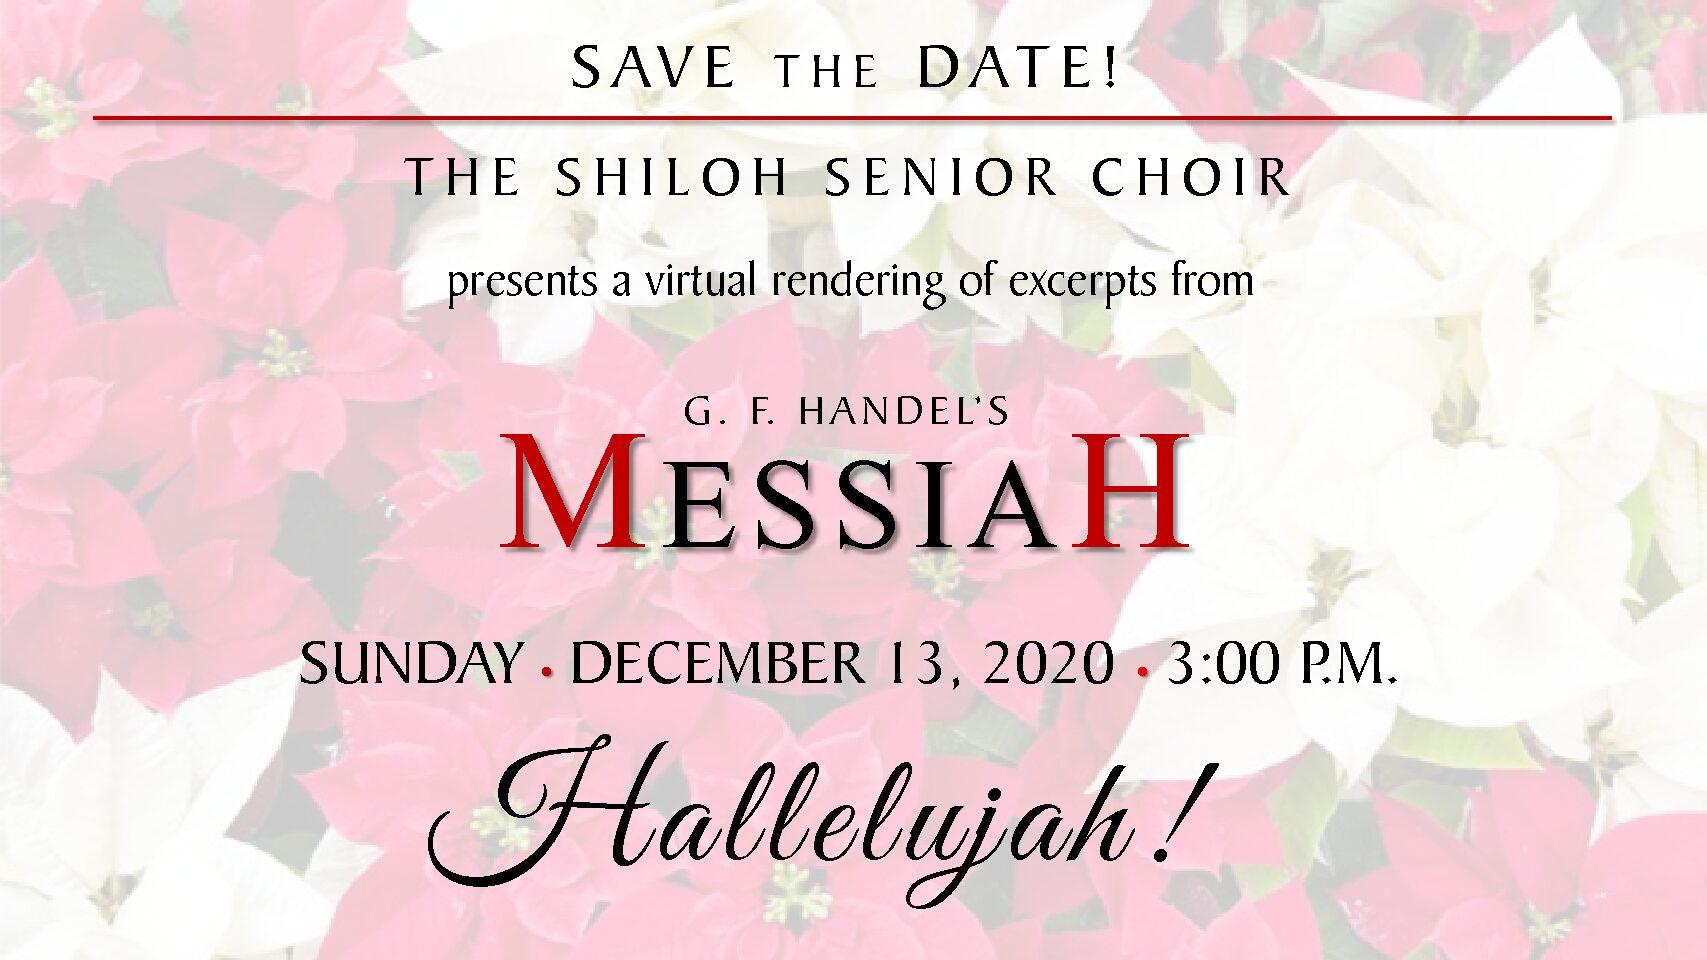 The Shiloh Senior Choir Presents: G.F. Handel's Messiah